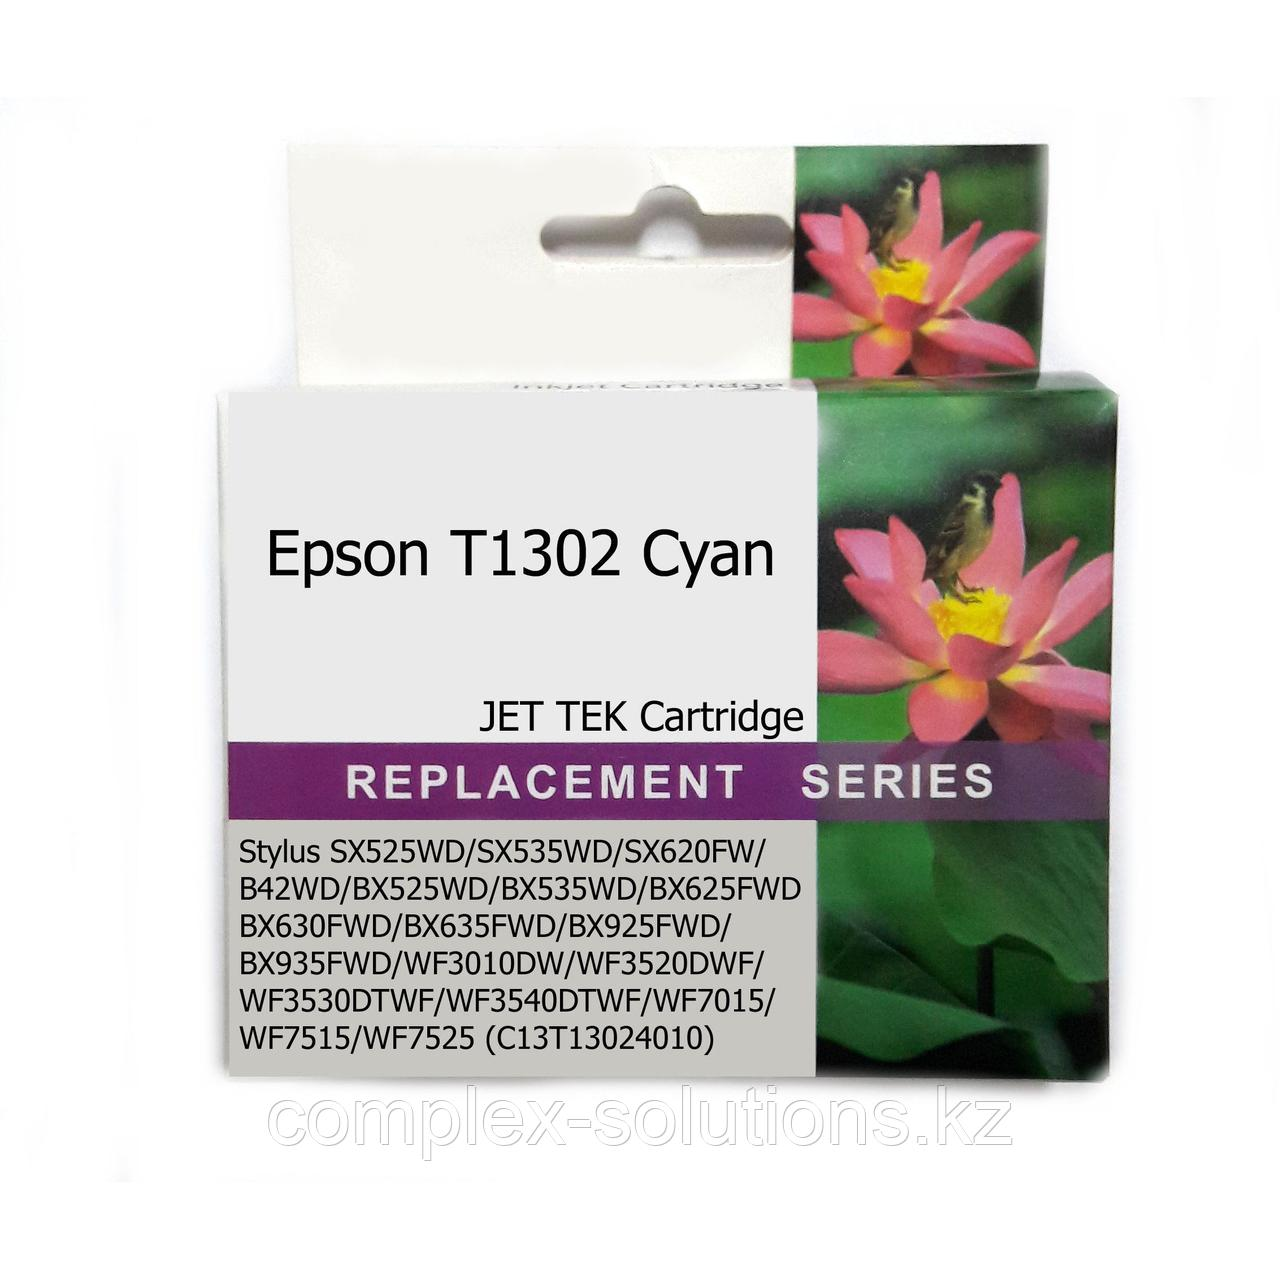 Картридж EPSON T1302 Cyan JET TEK | [качественный дубликат]